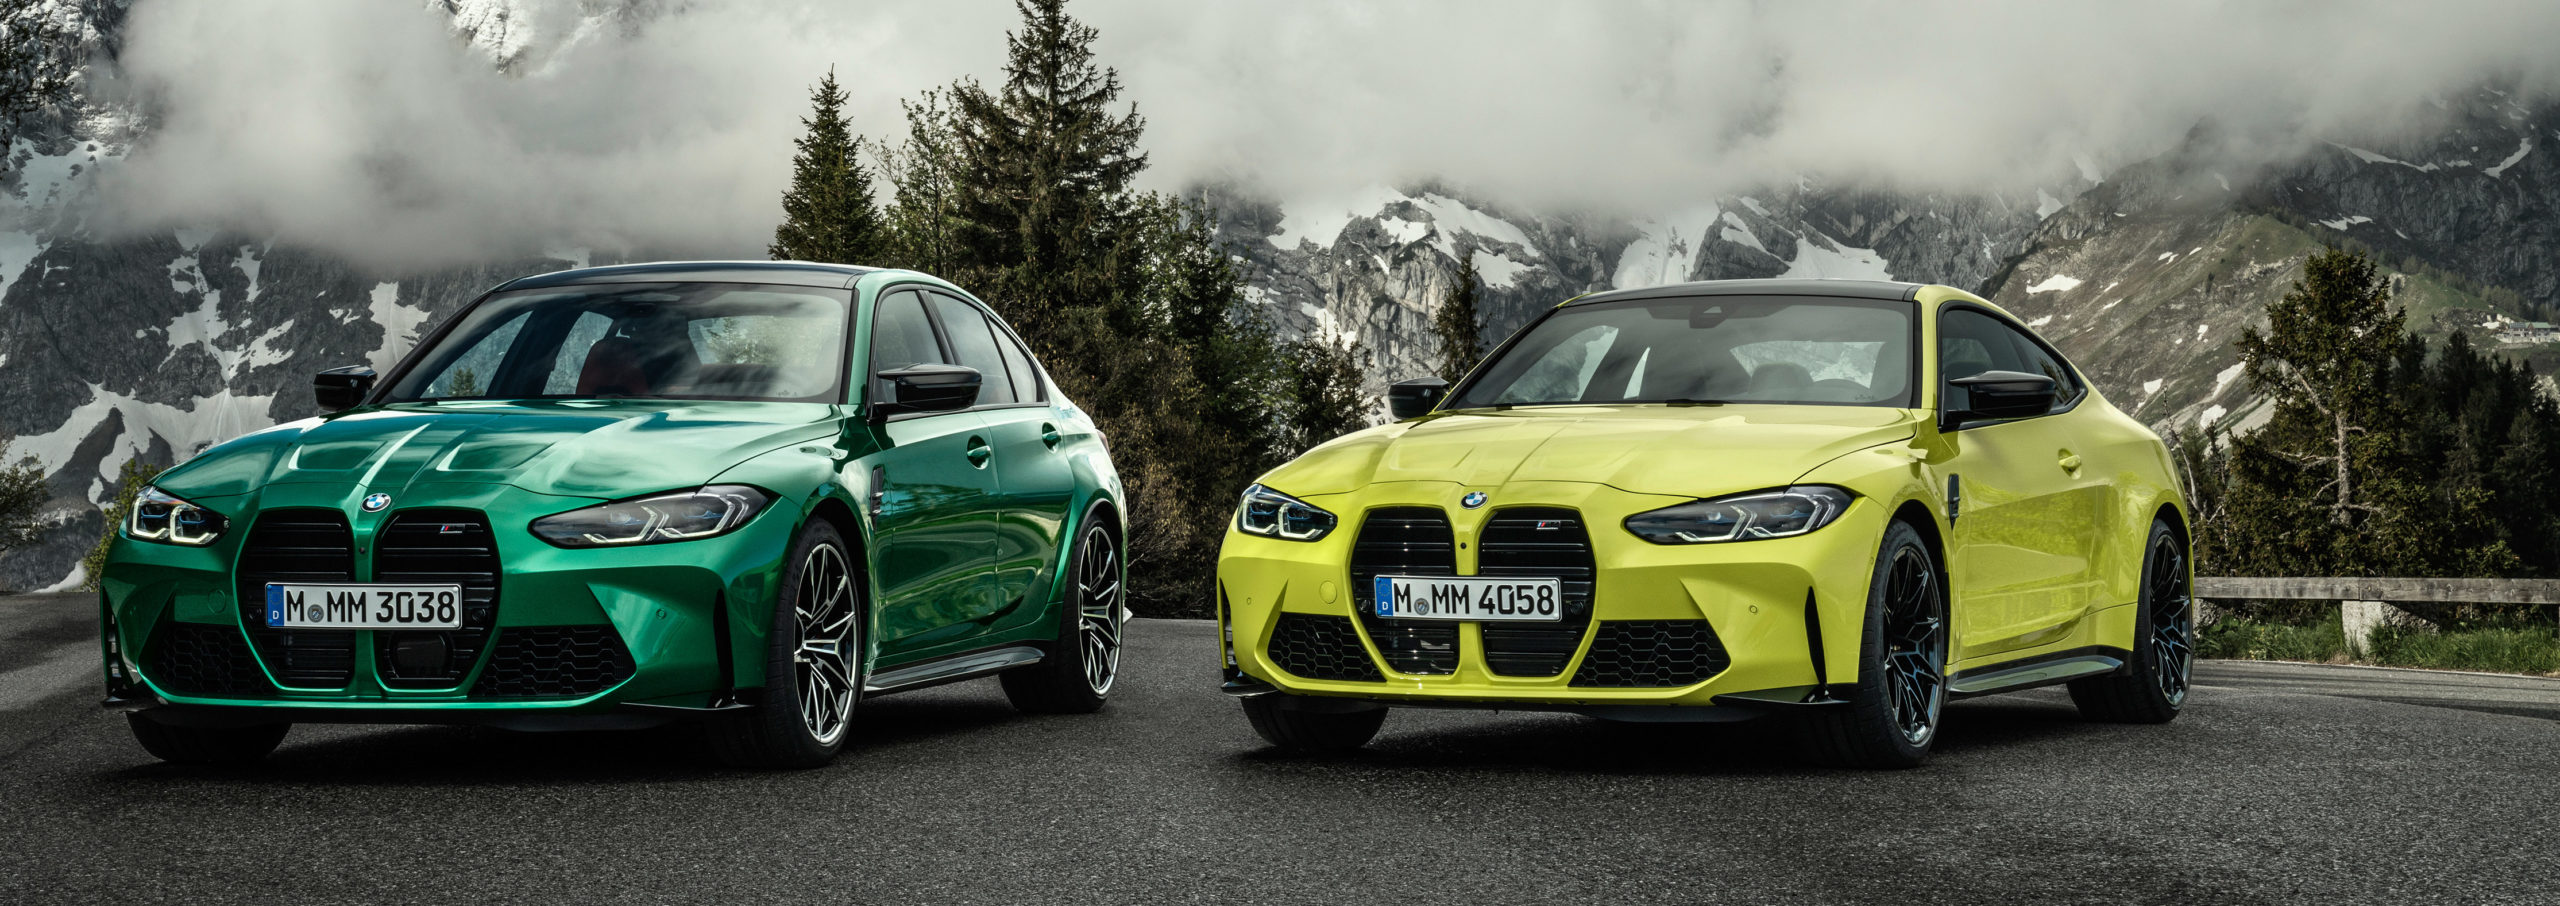 Precios BMW M3 y M4 Competition